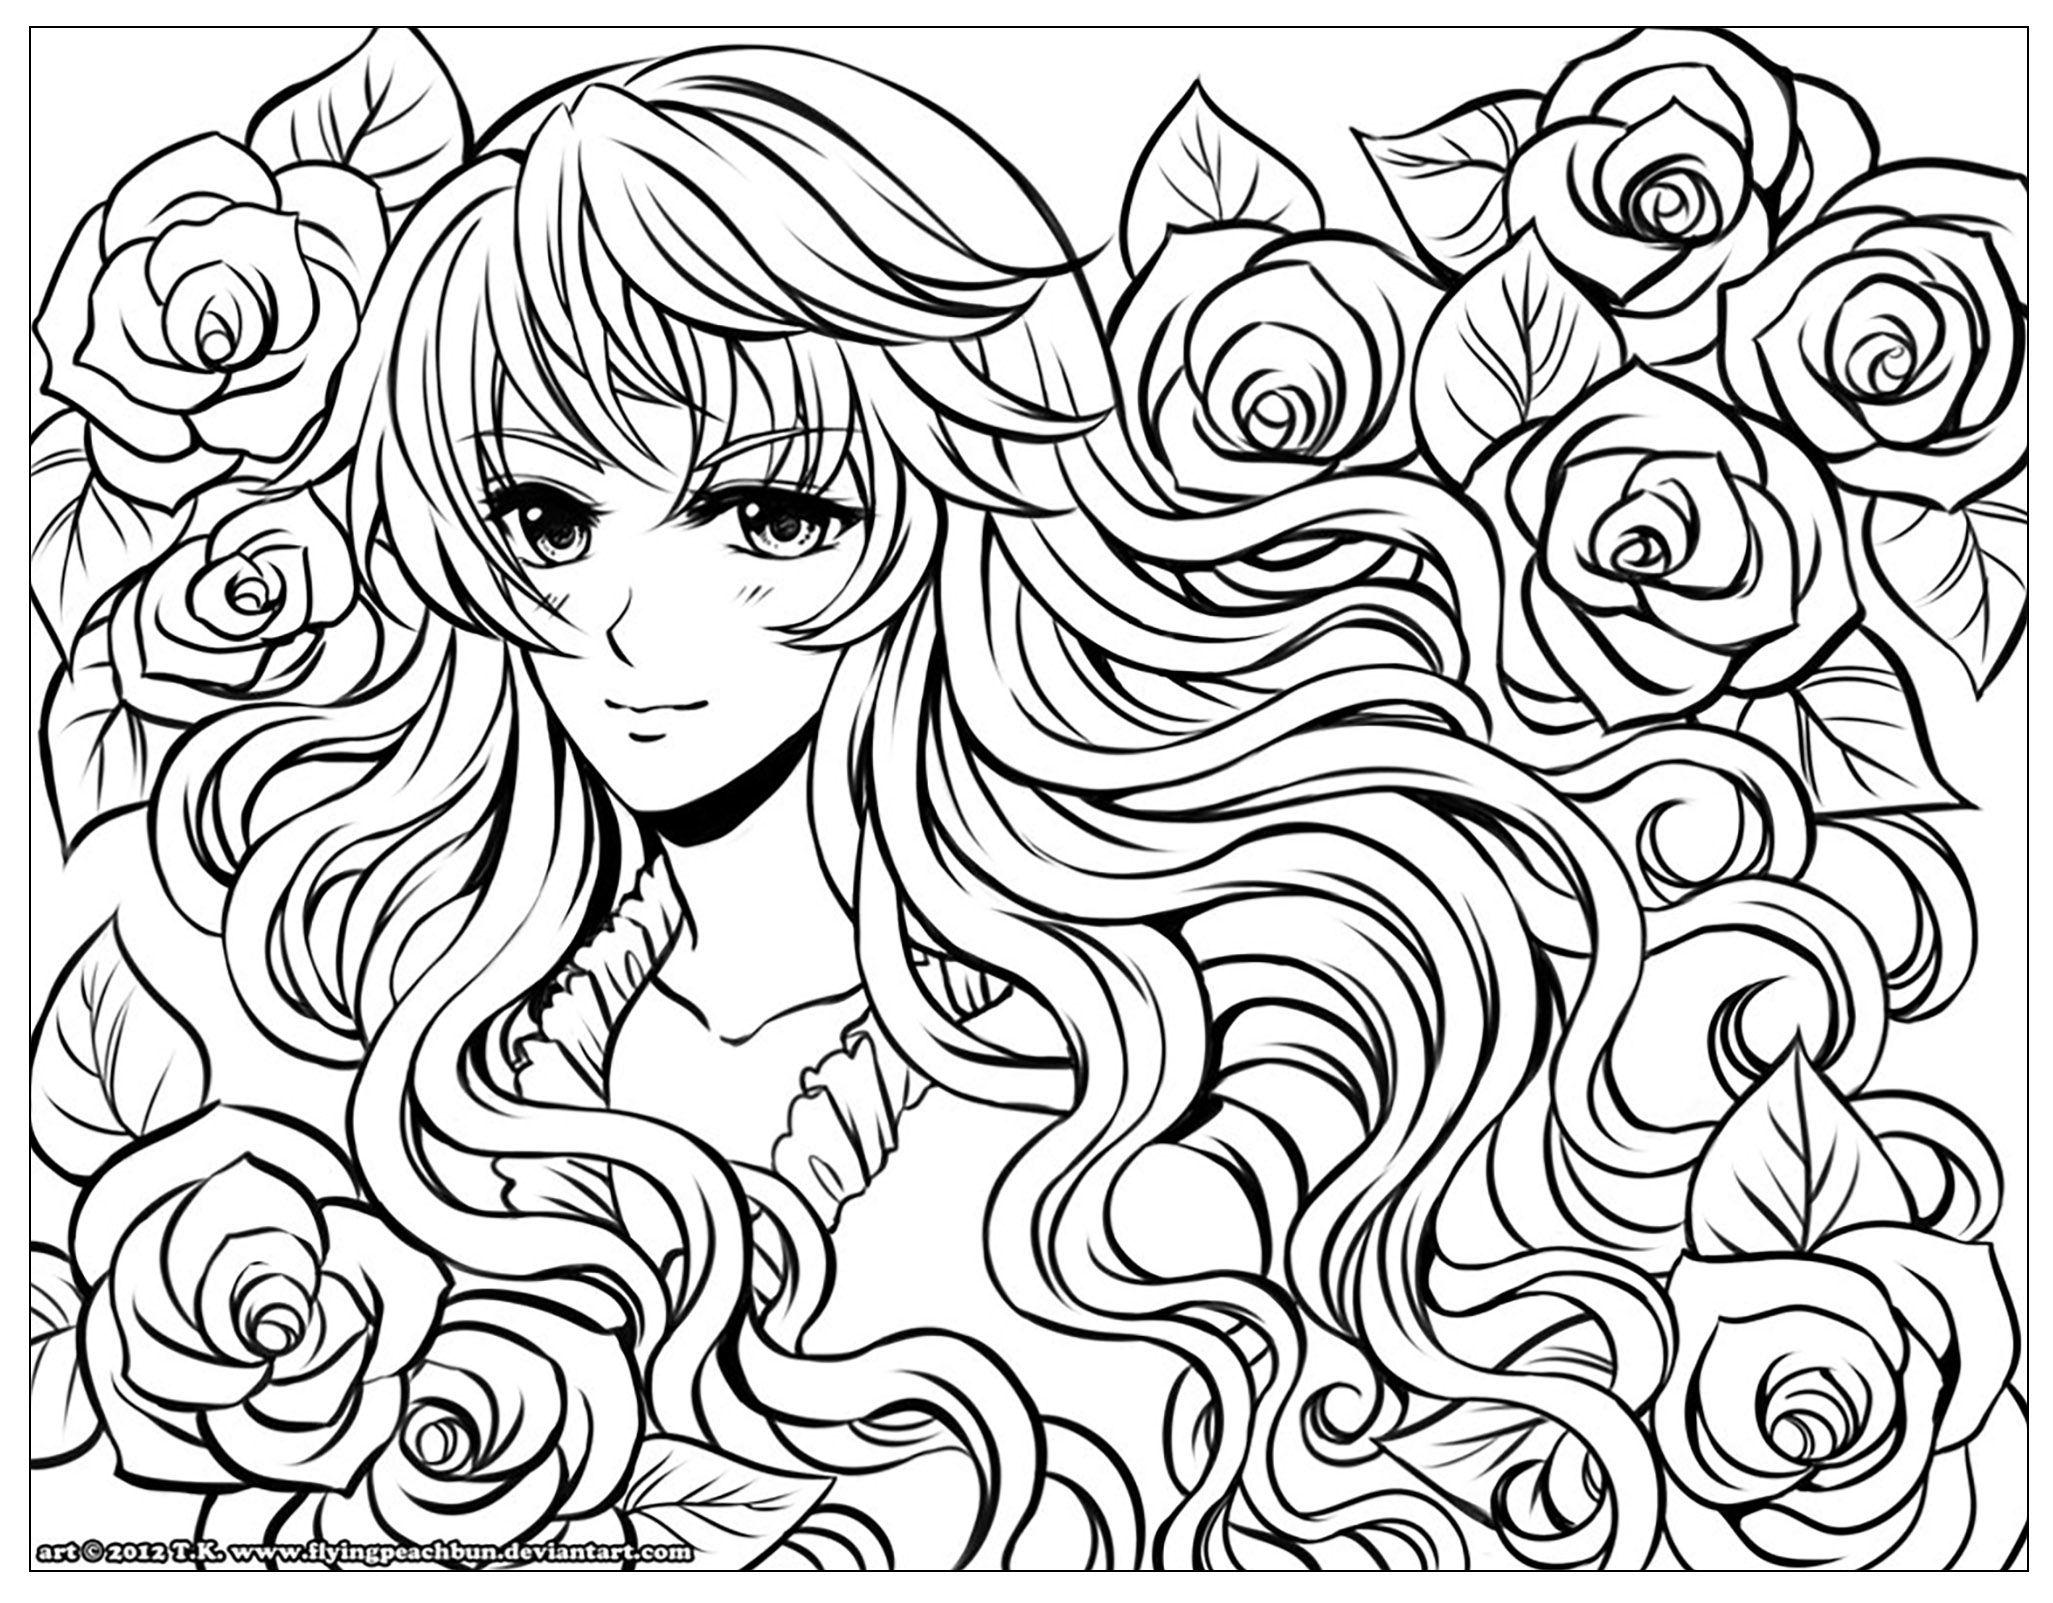 Ausmalbilder Manga Mädchen : Manga Girl With Flowers In Her Hair By Flyingpeachbun From The